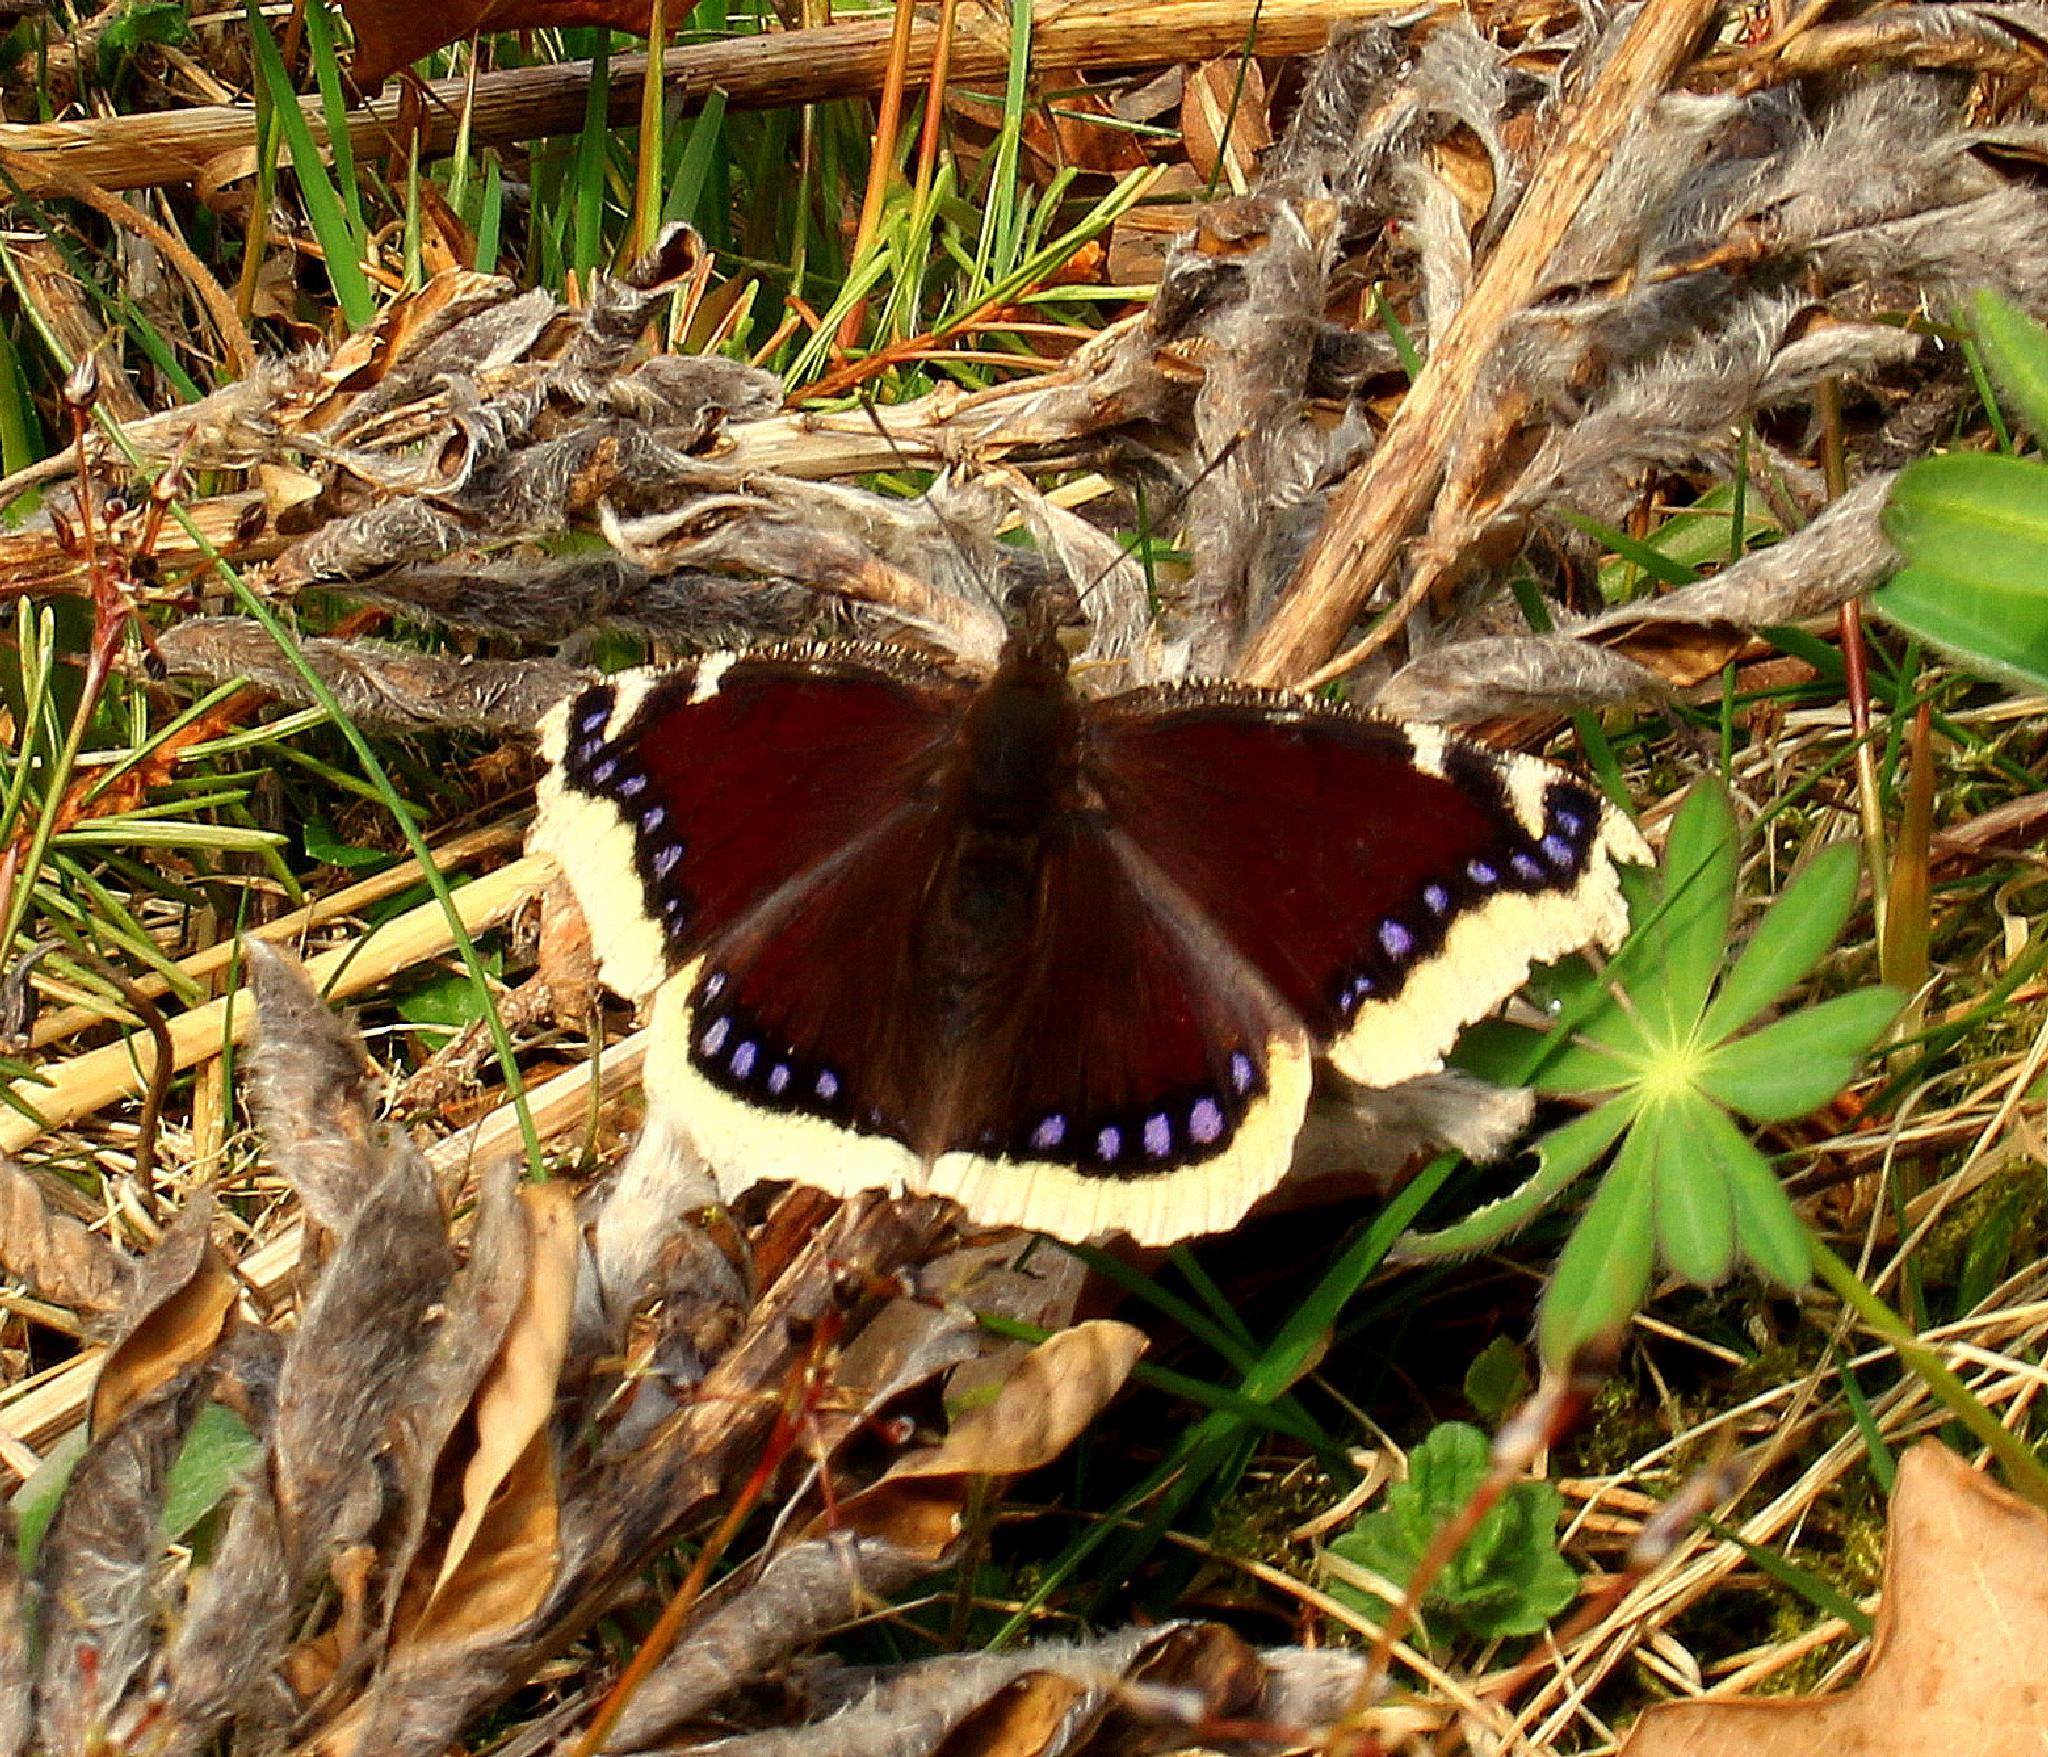 Butterfly in the garden by susannemkarlsson